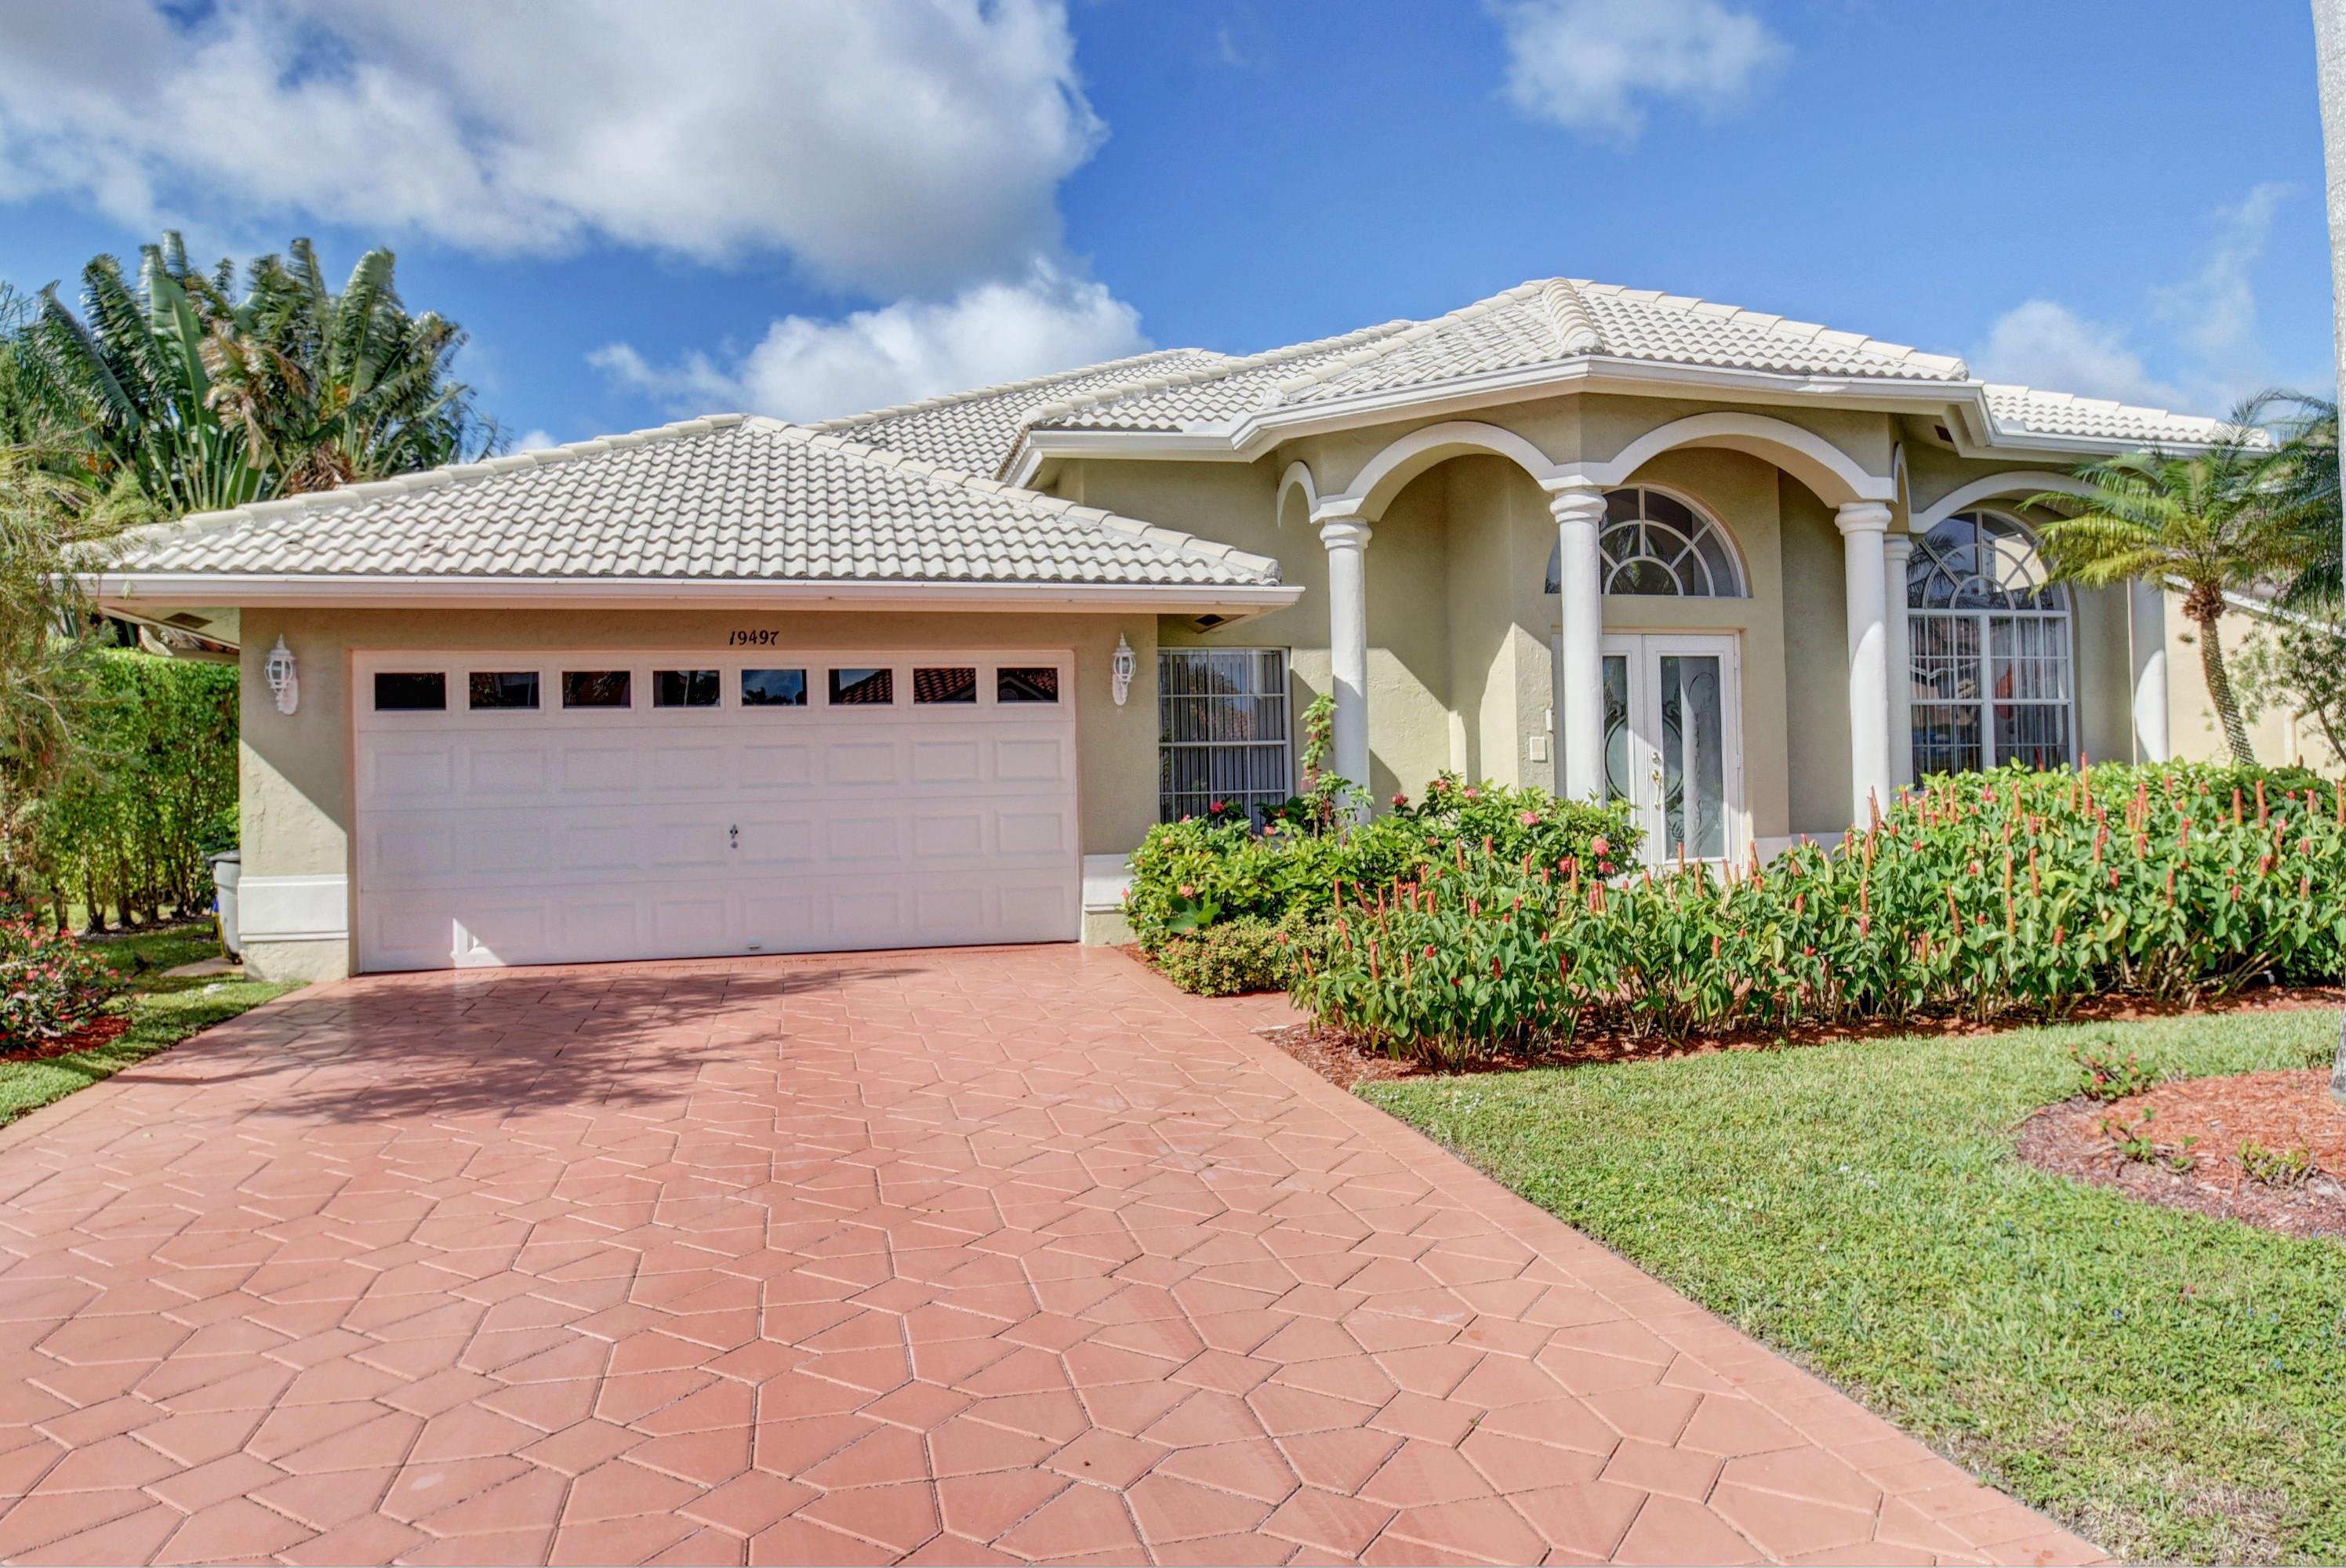 BOCA ISLES WEST - 4 properties for sale, Boca Raton,33498 ...